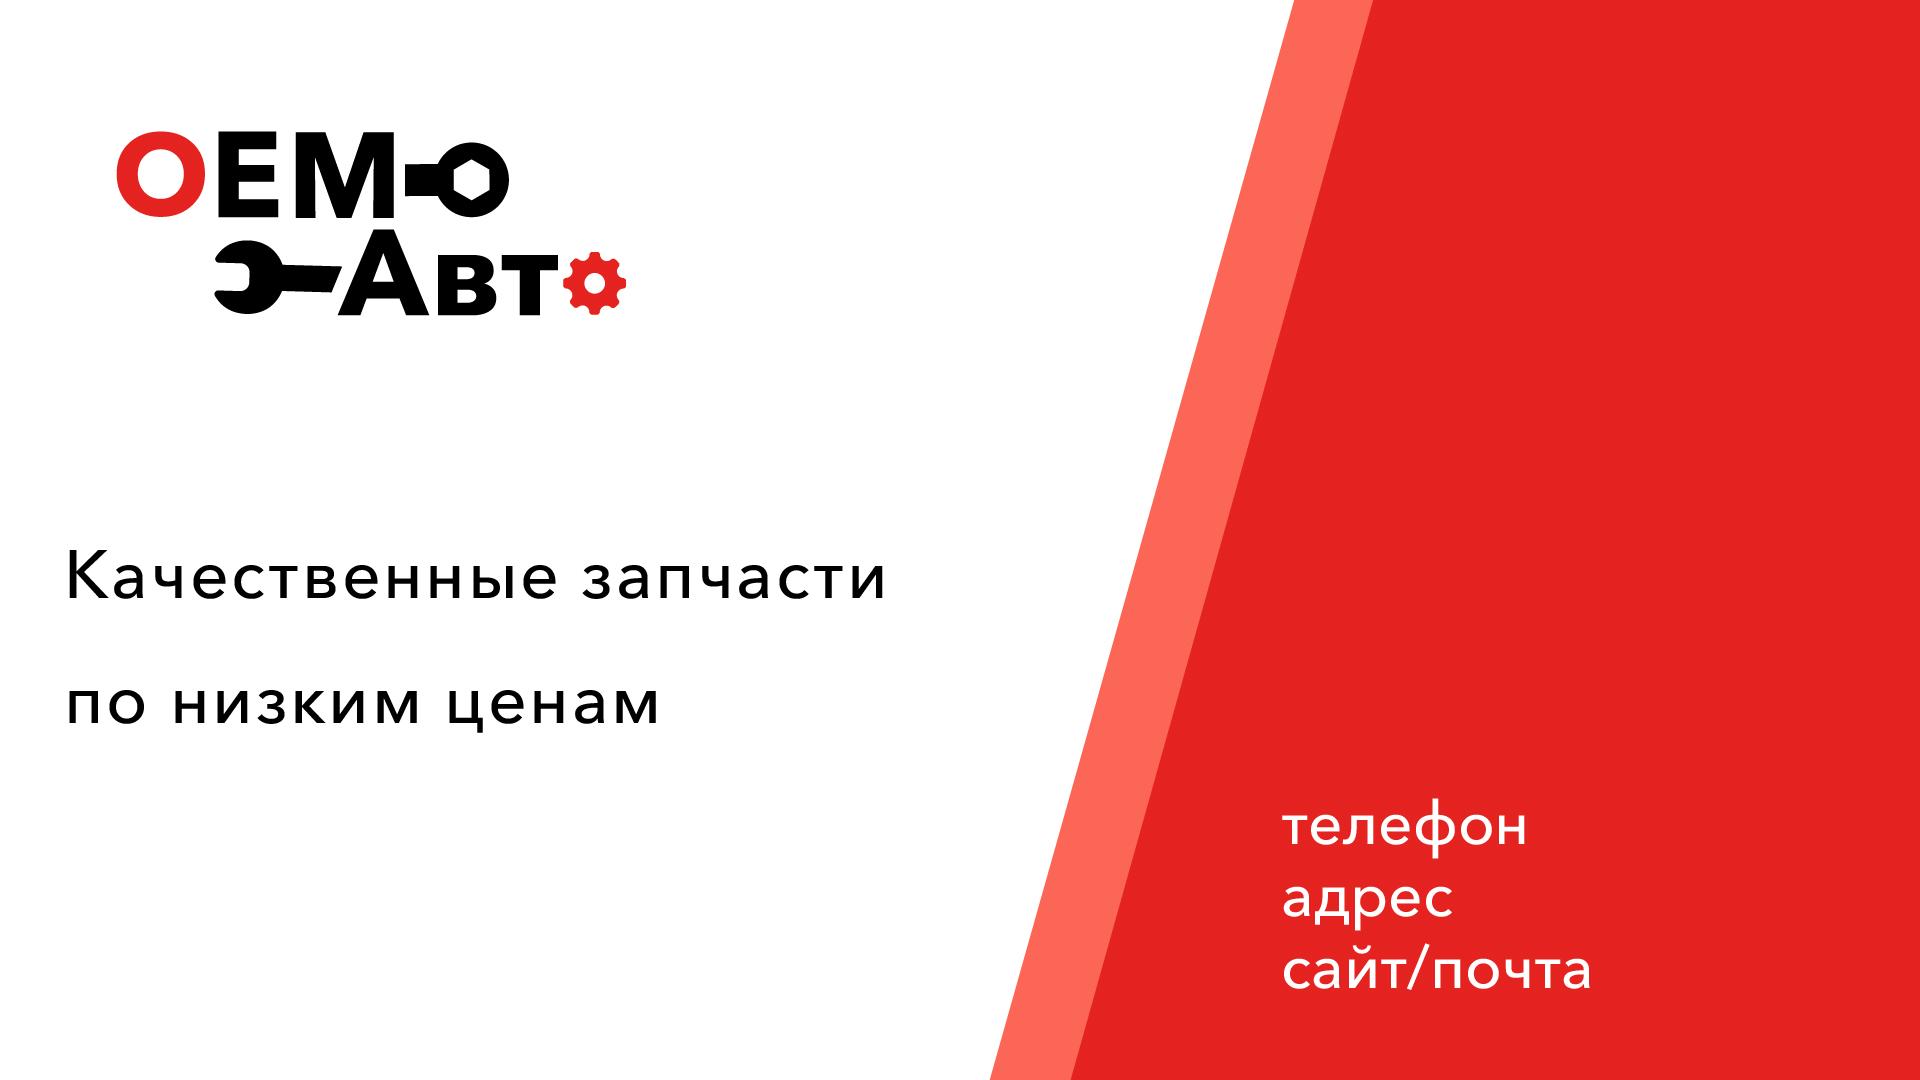 Разработать логотип и дизайн визитки  фото f_1435b686005e0de0.jpg